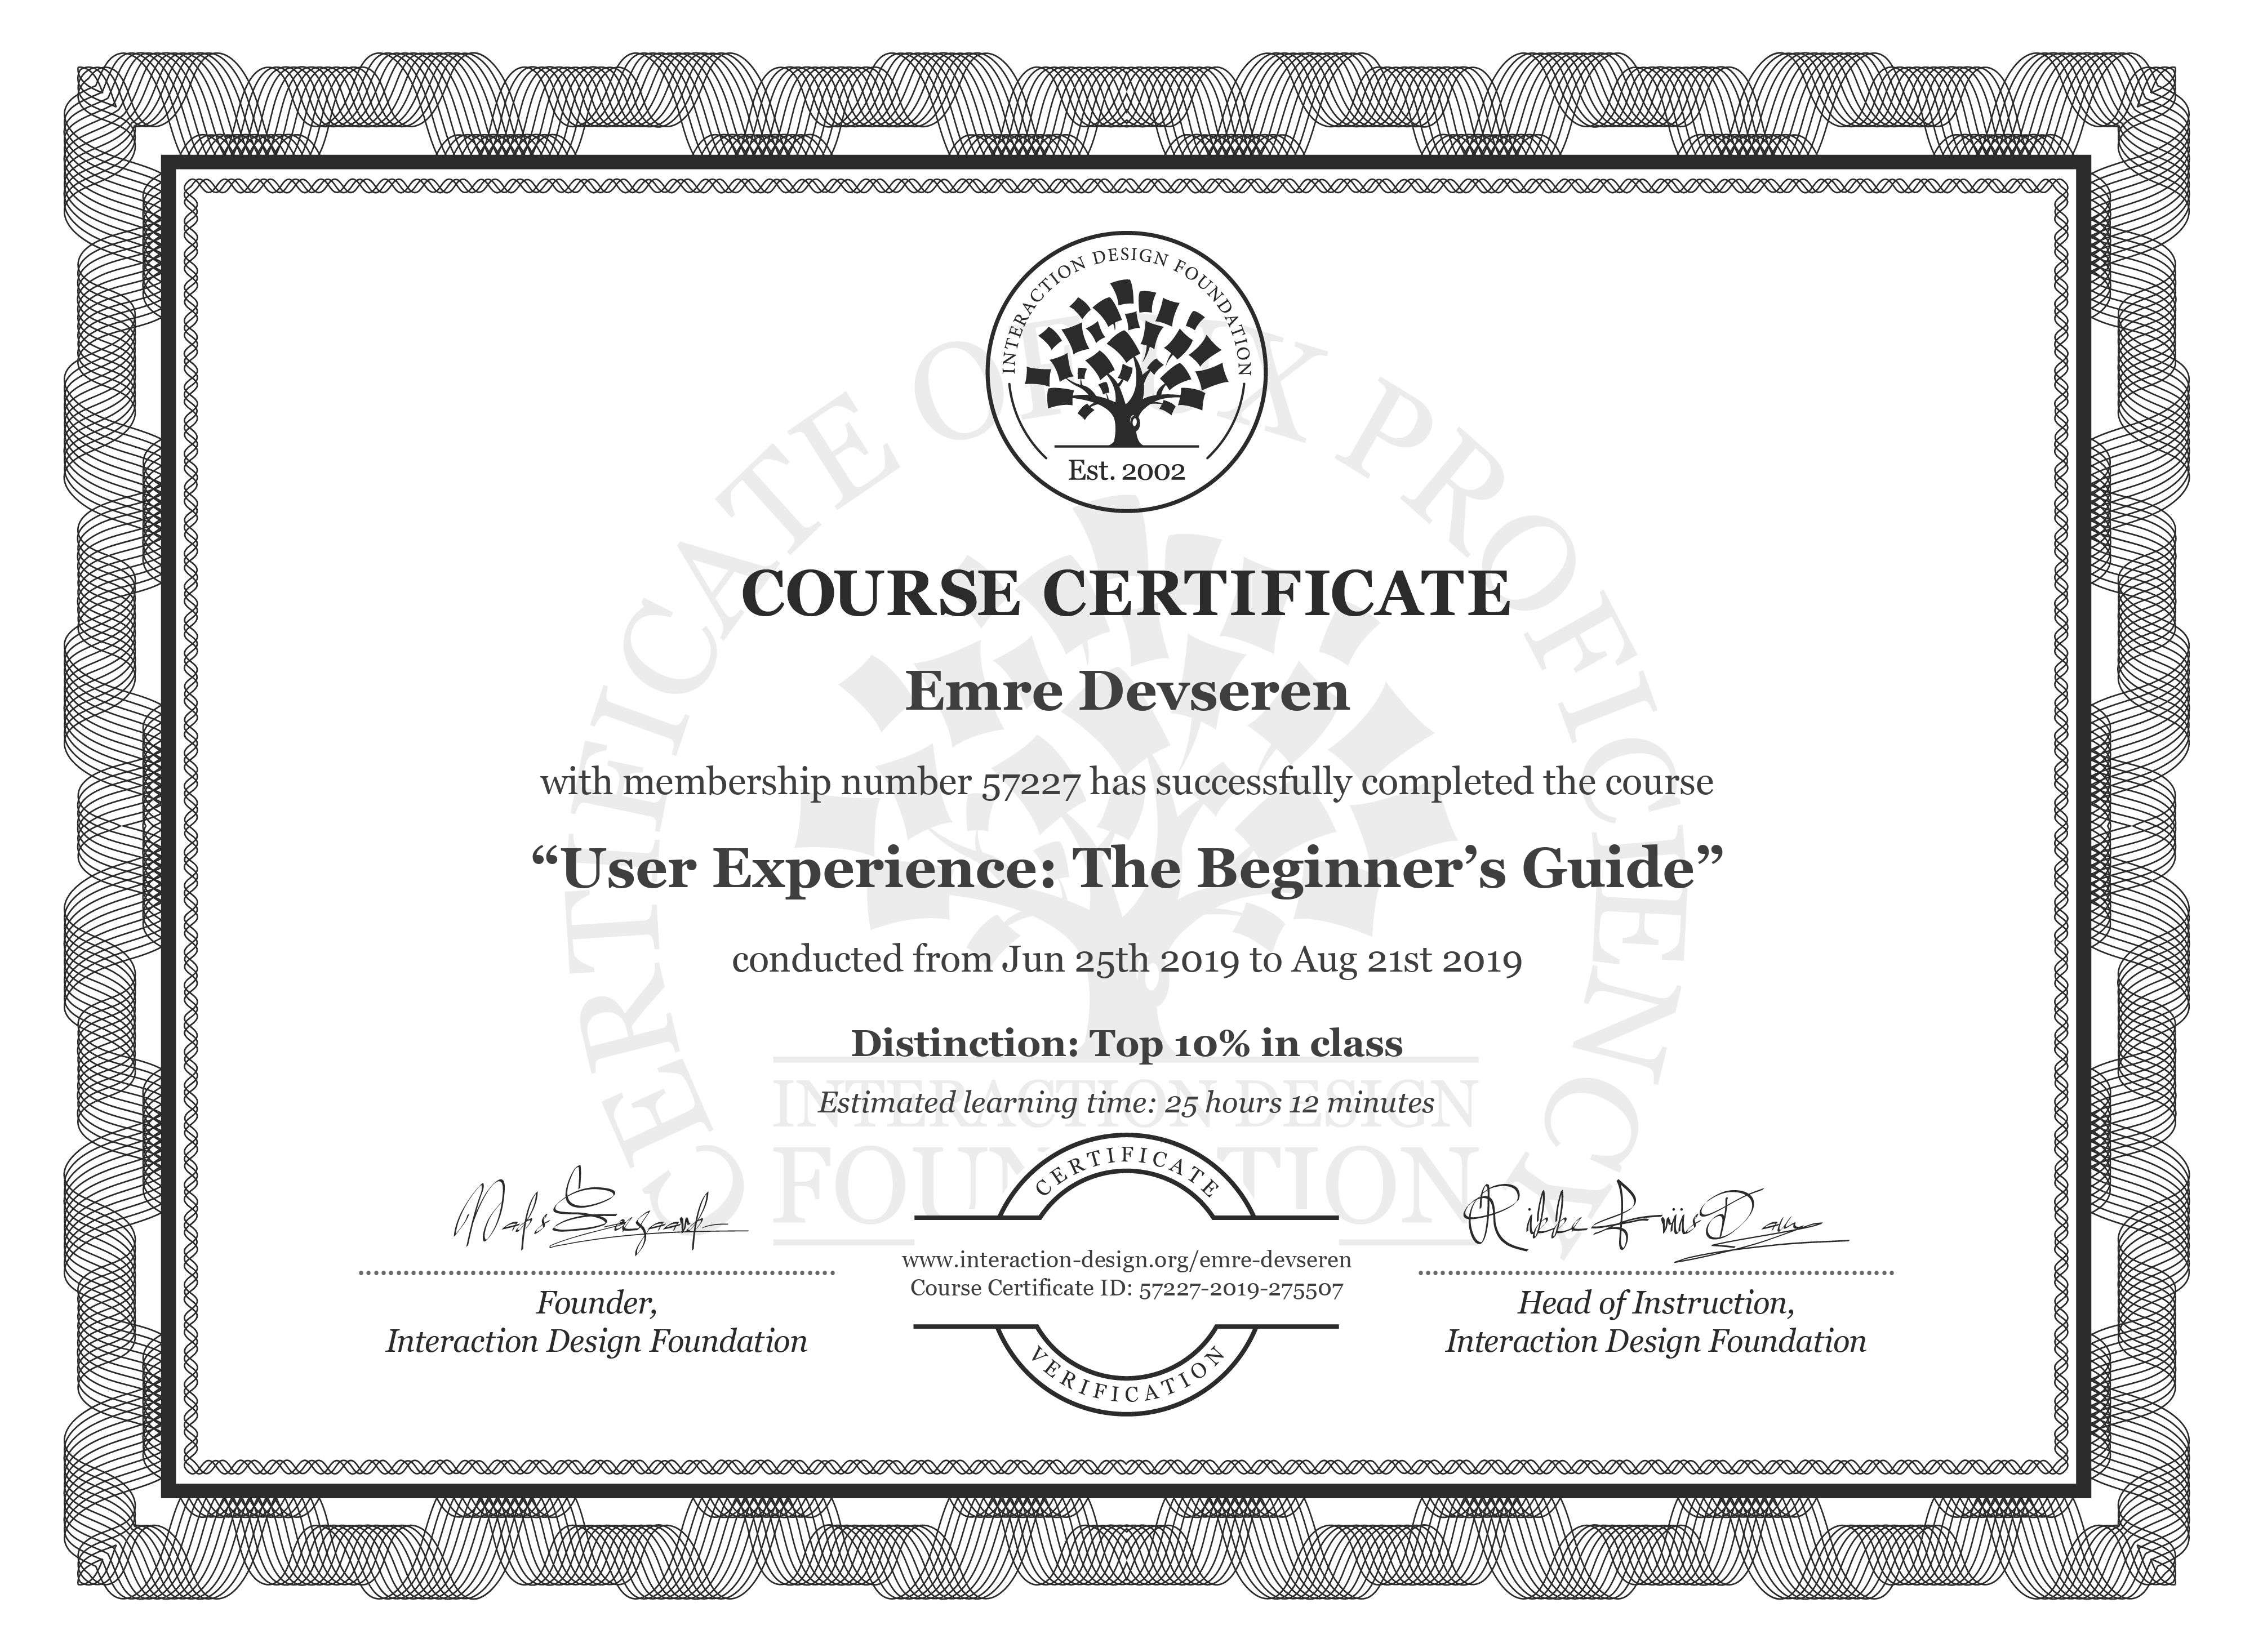 Emre Devseren's Course Certificate: Become a UX Designer from Scratch